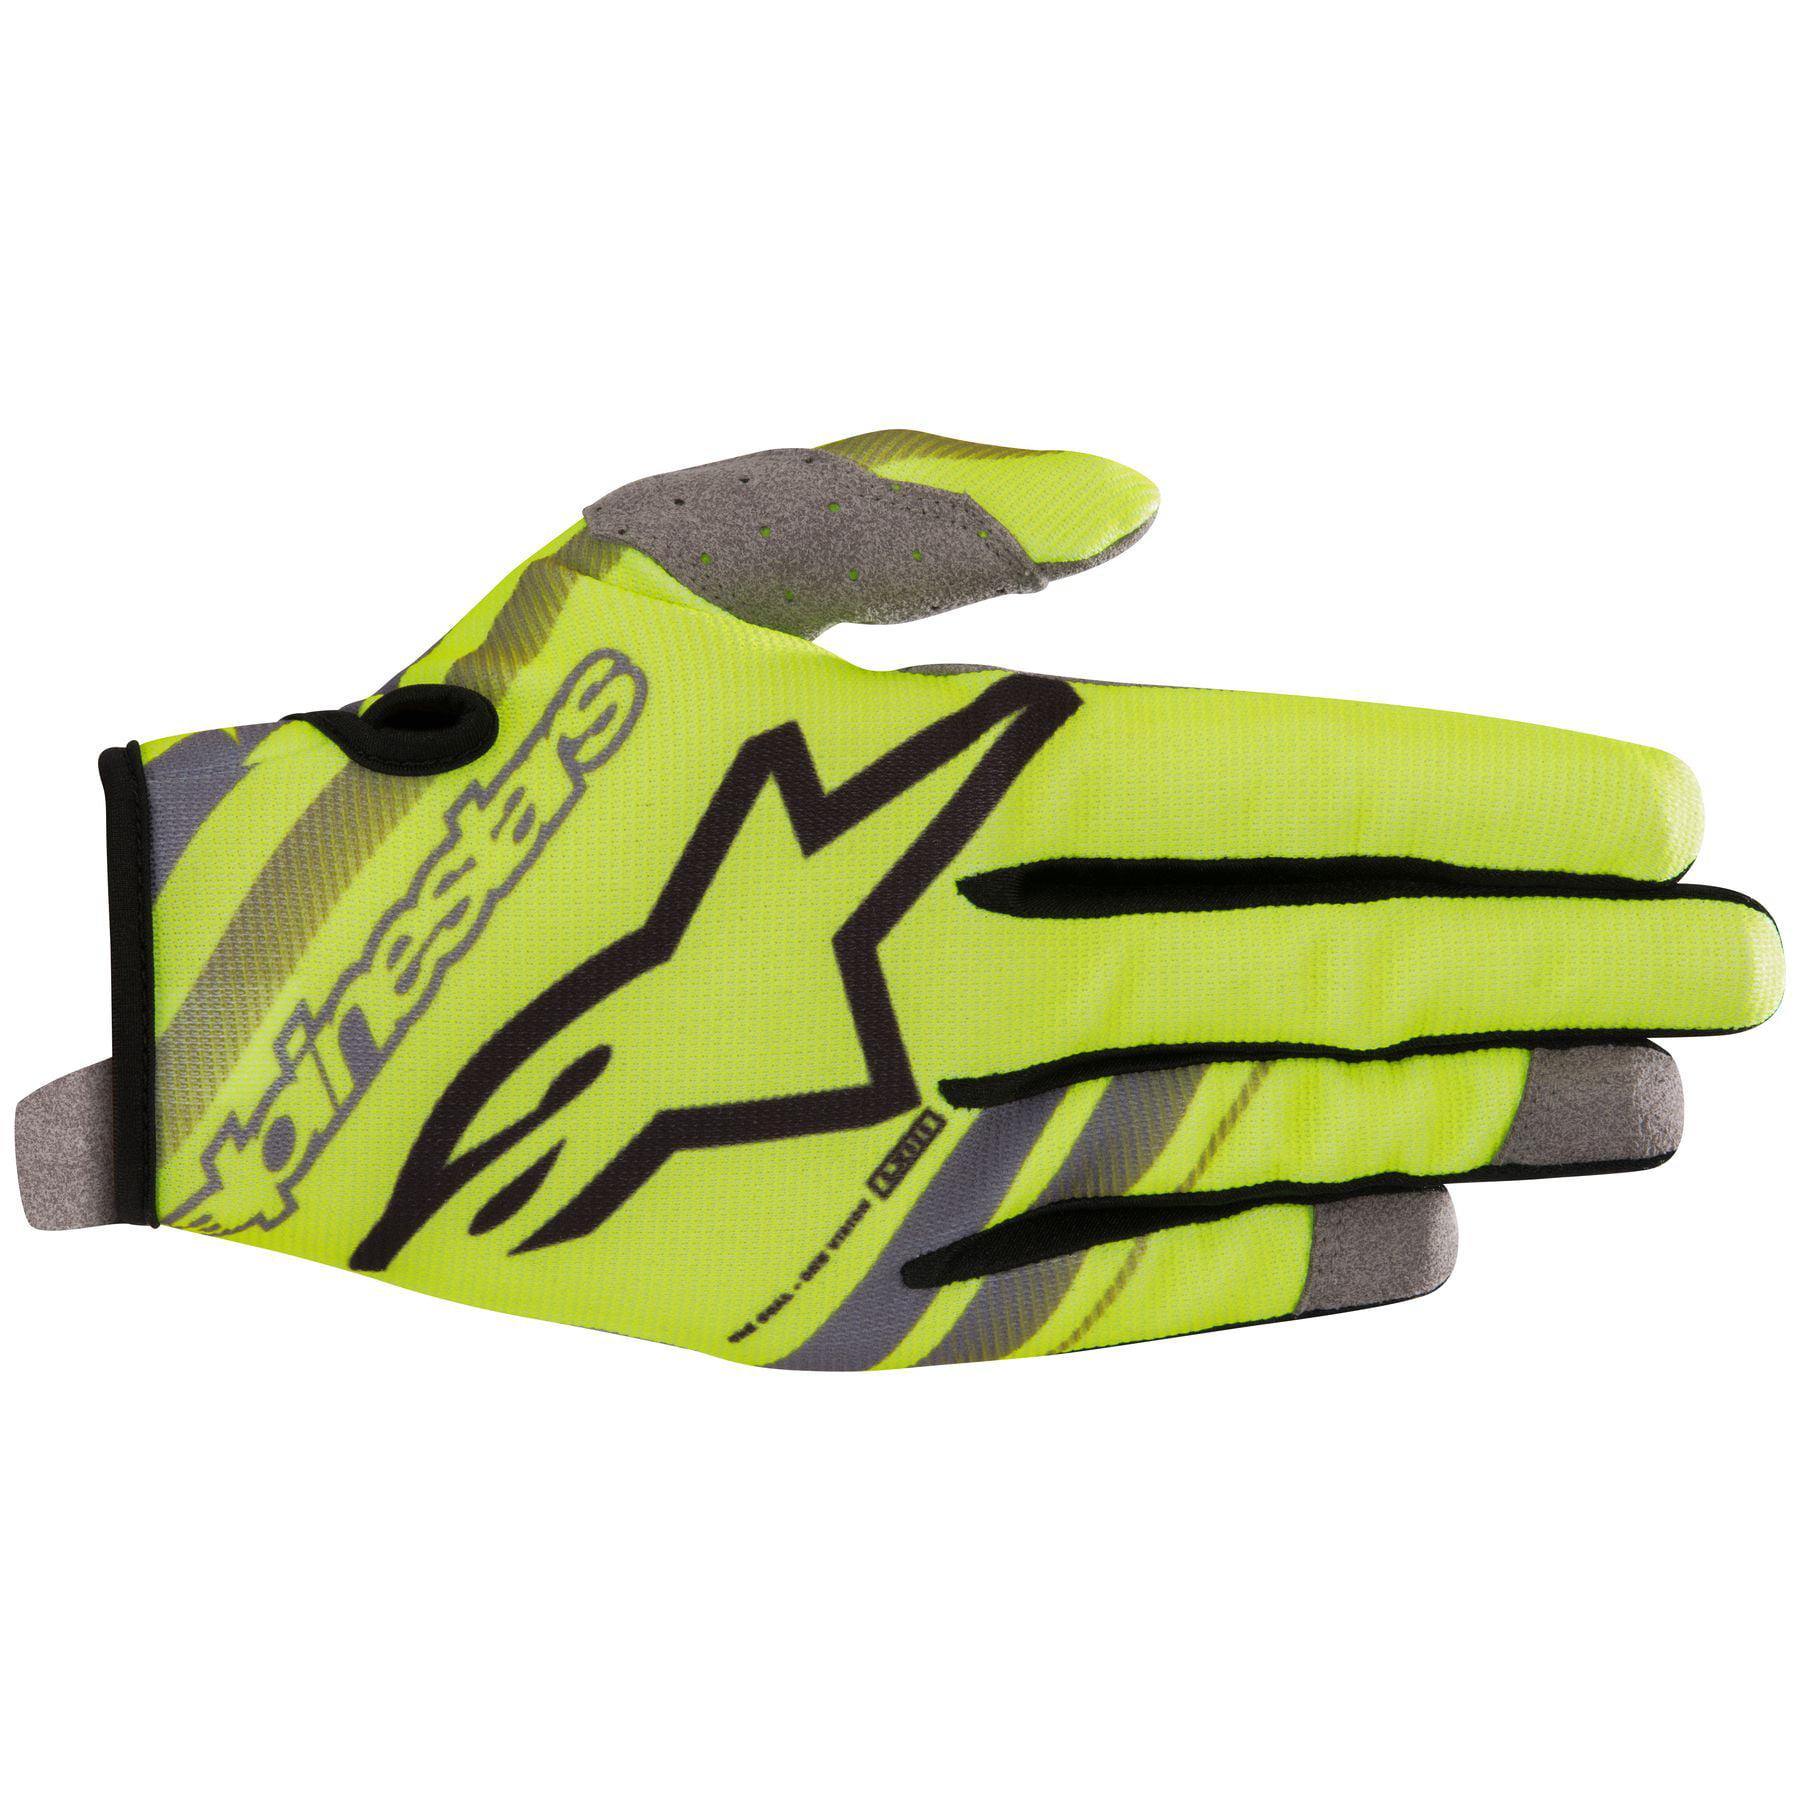 Alpinestars Youth Radar Motorcycle Gloves, Yellow / Black Y2Xs, 3541819-551-XXS 3541819-551-XXS;